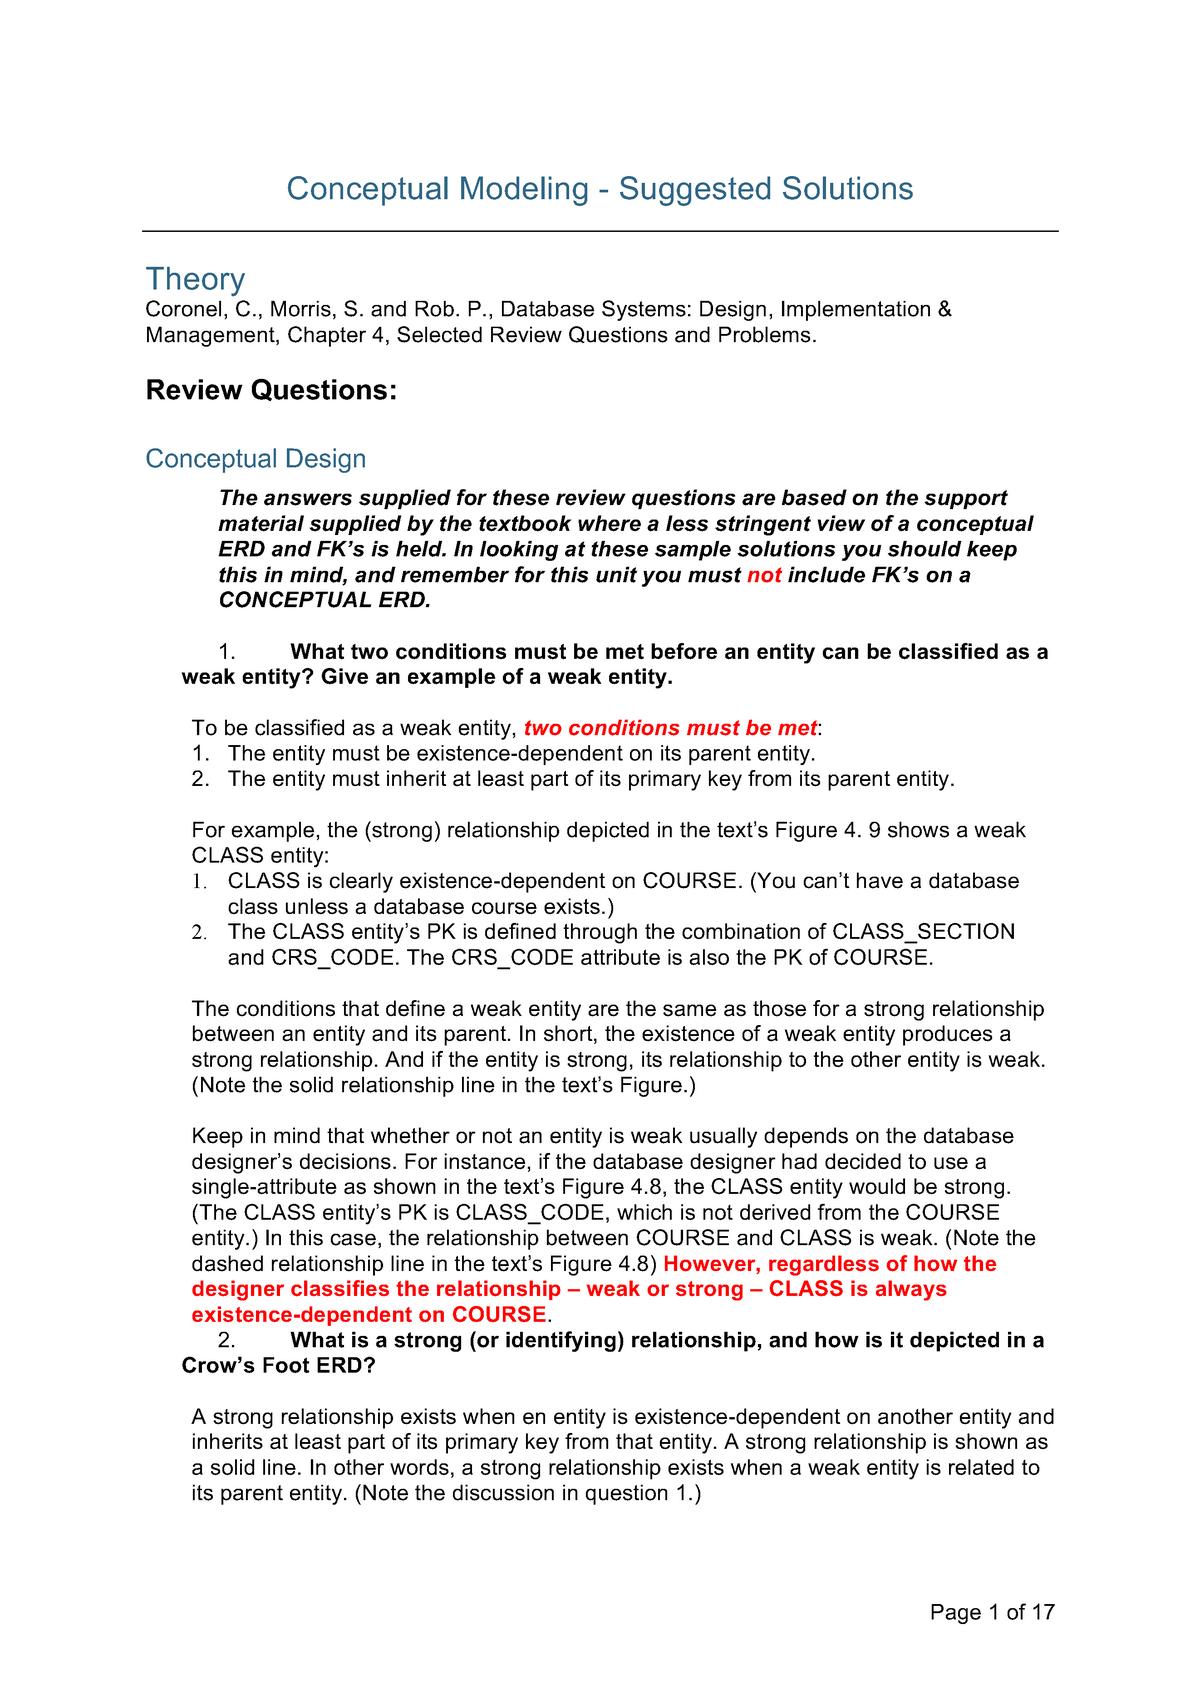 Week 3 Conceptual Modelling Sample Solutions Fit2094 Studocu